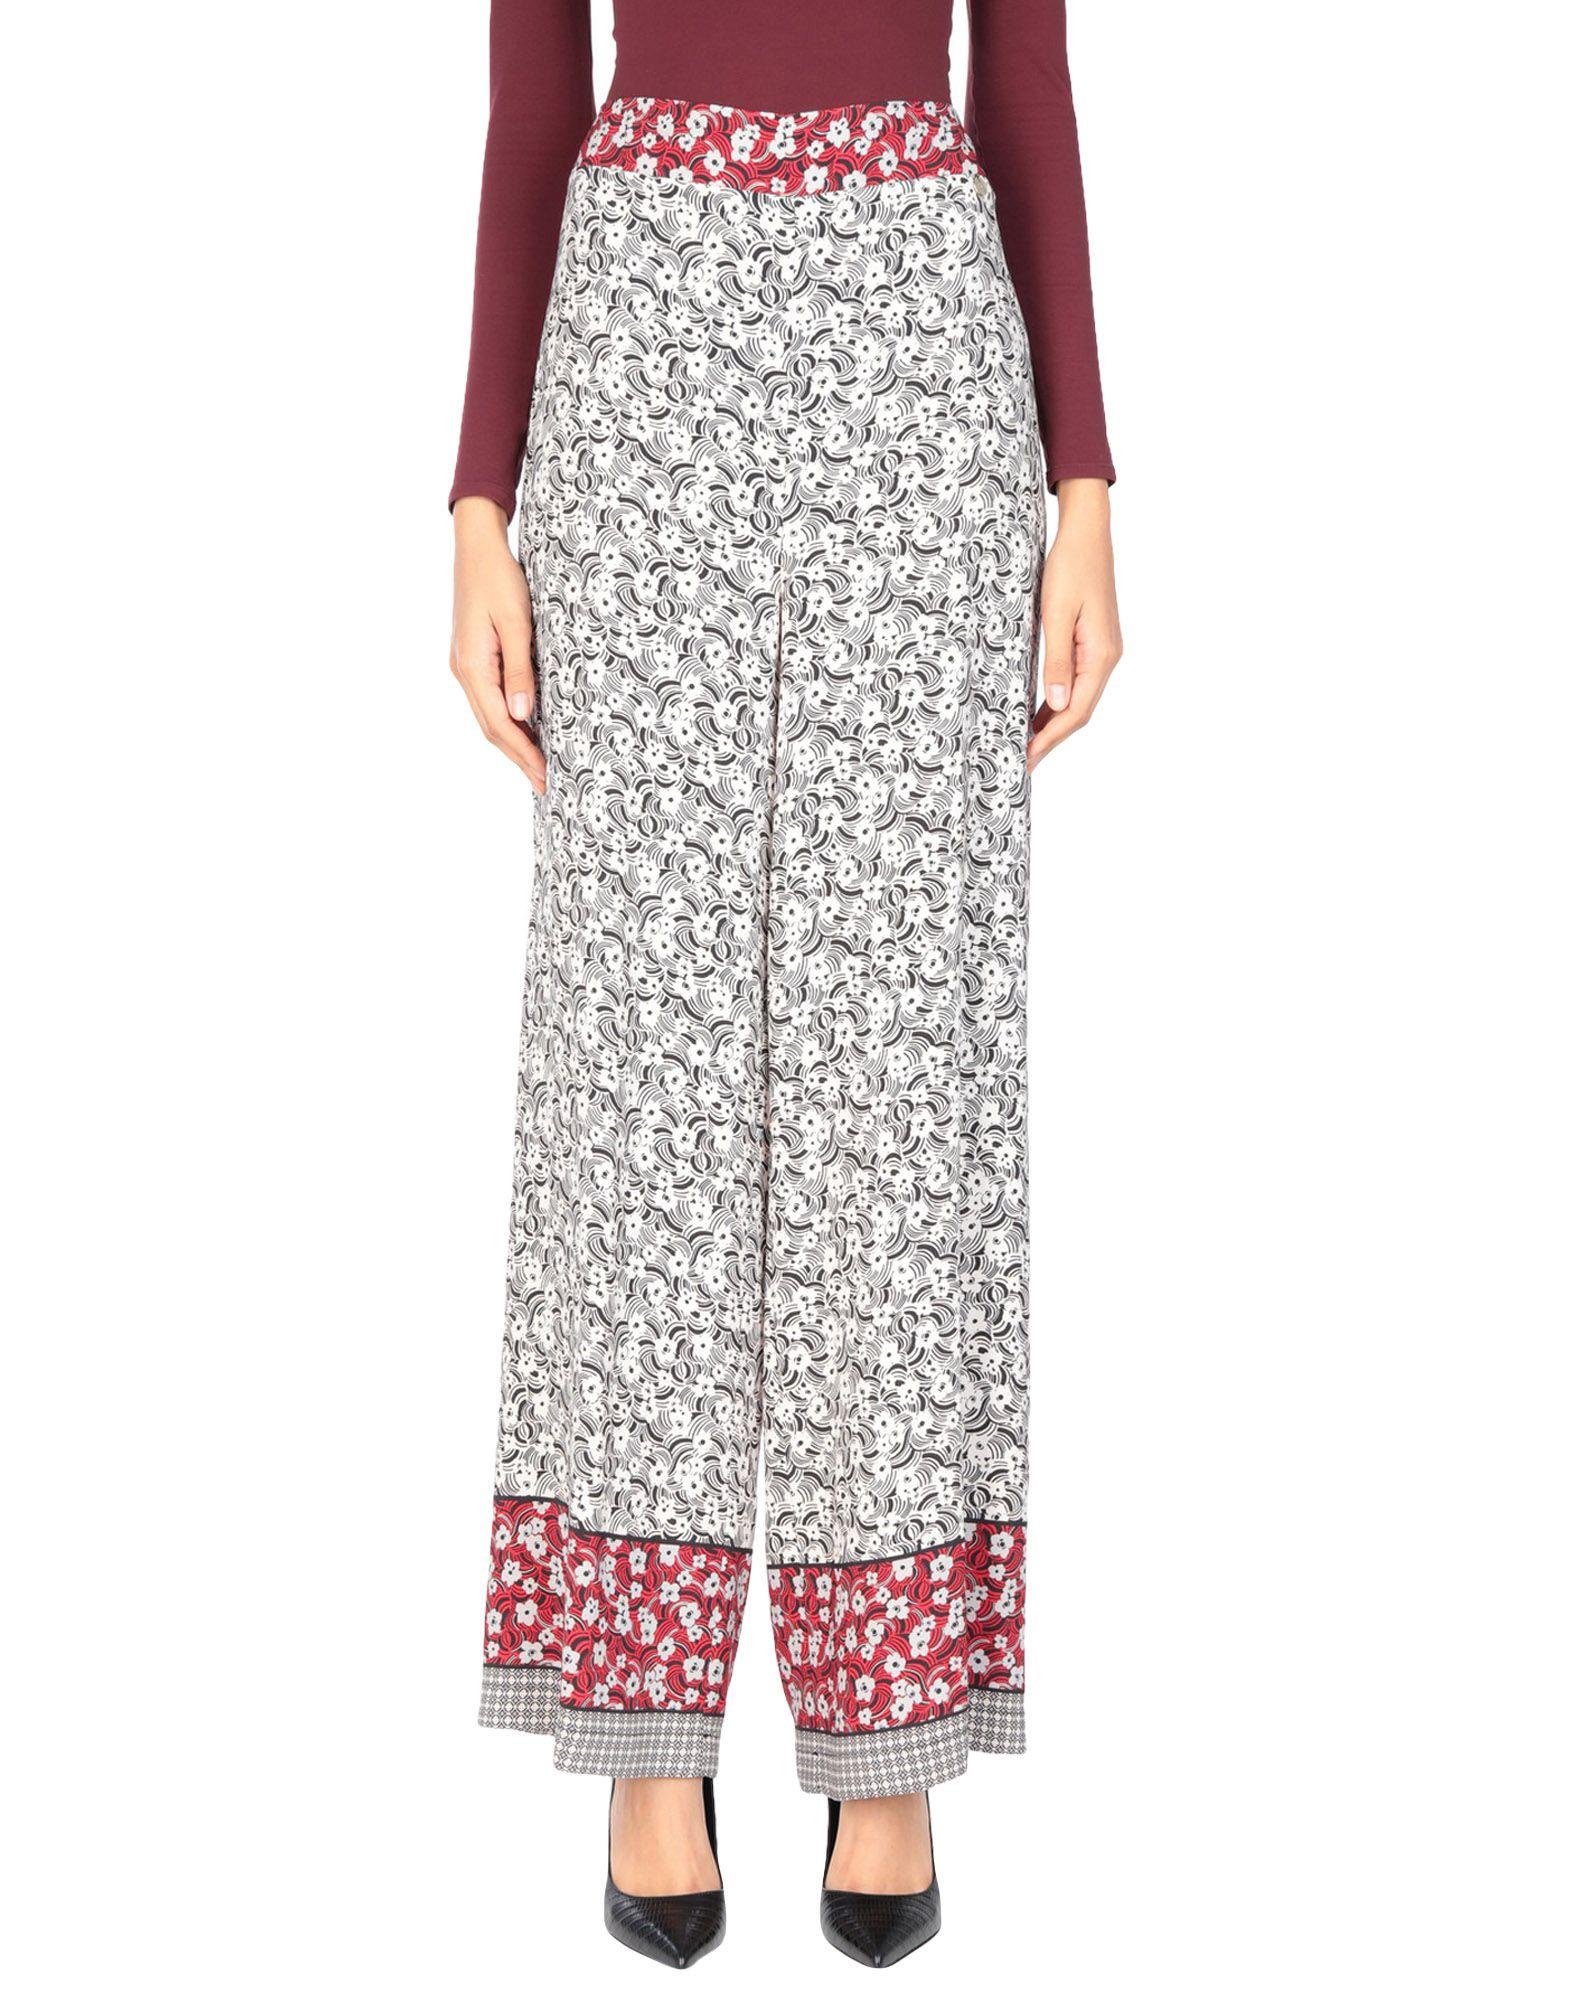 CRISTINA GAVIOLI COLLECTION Повседневные брюки cristina gavioli collection длинная юбка